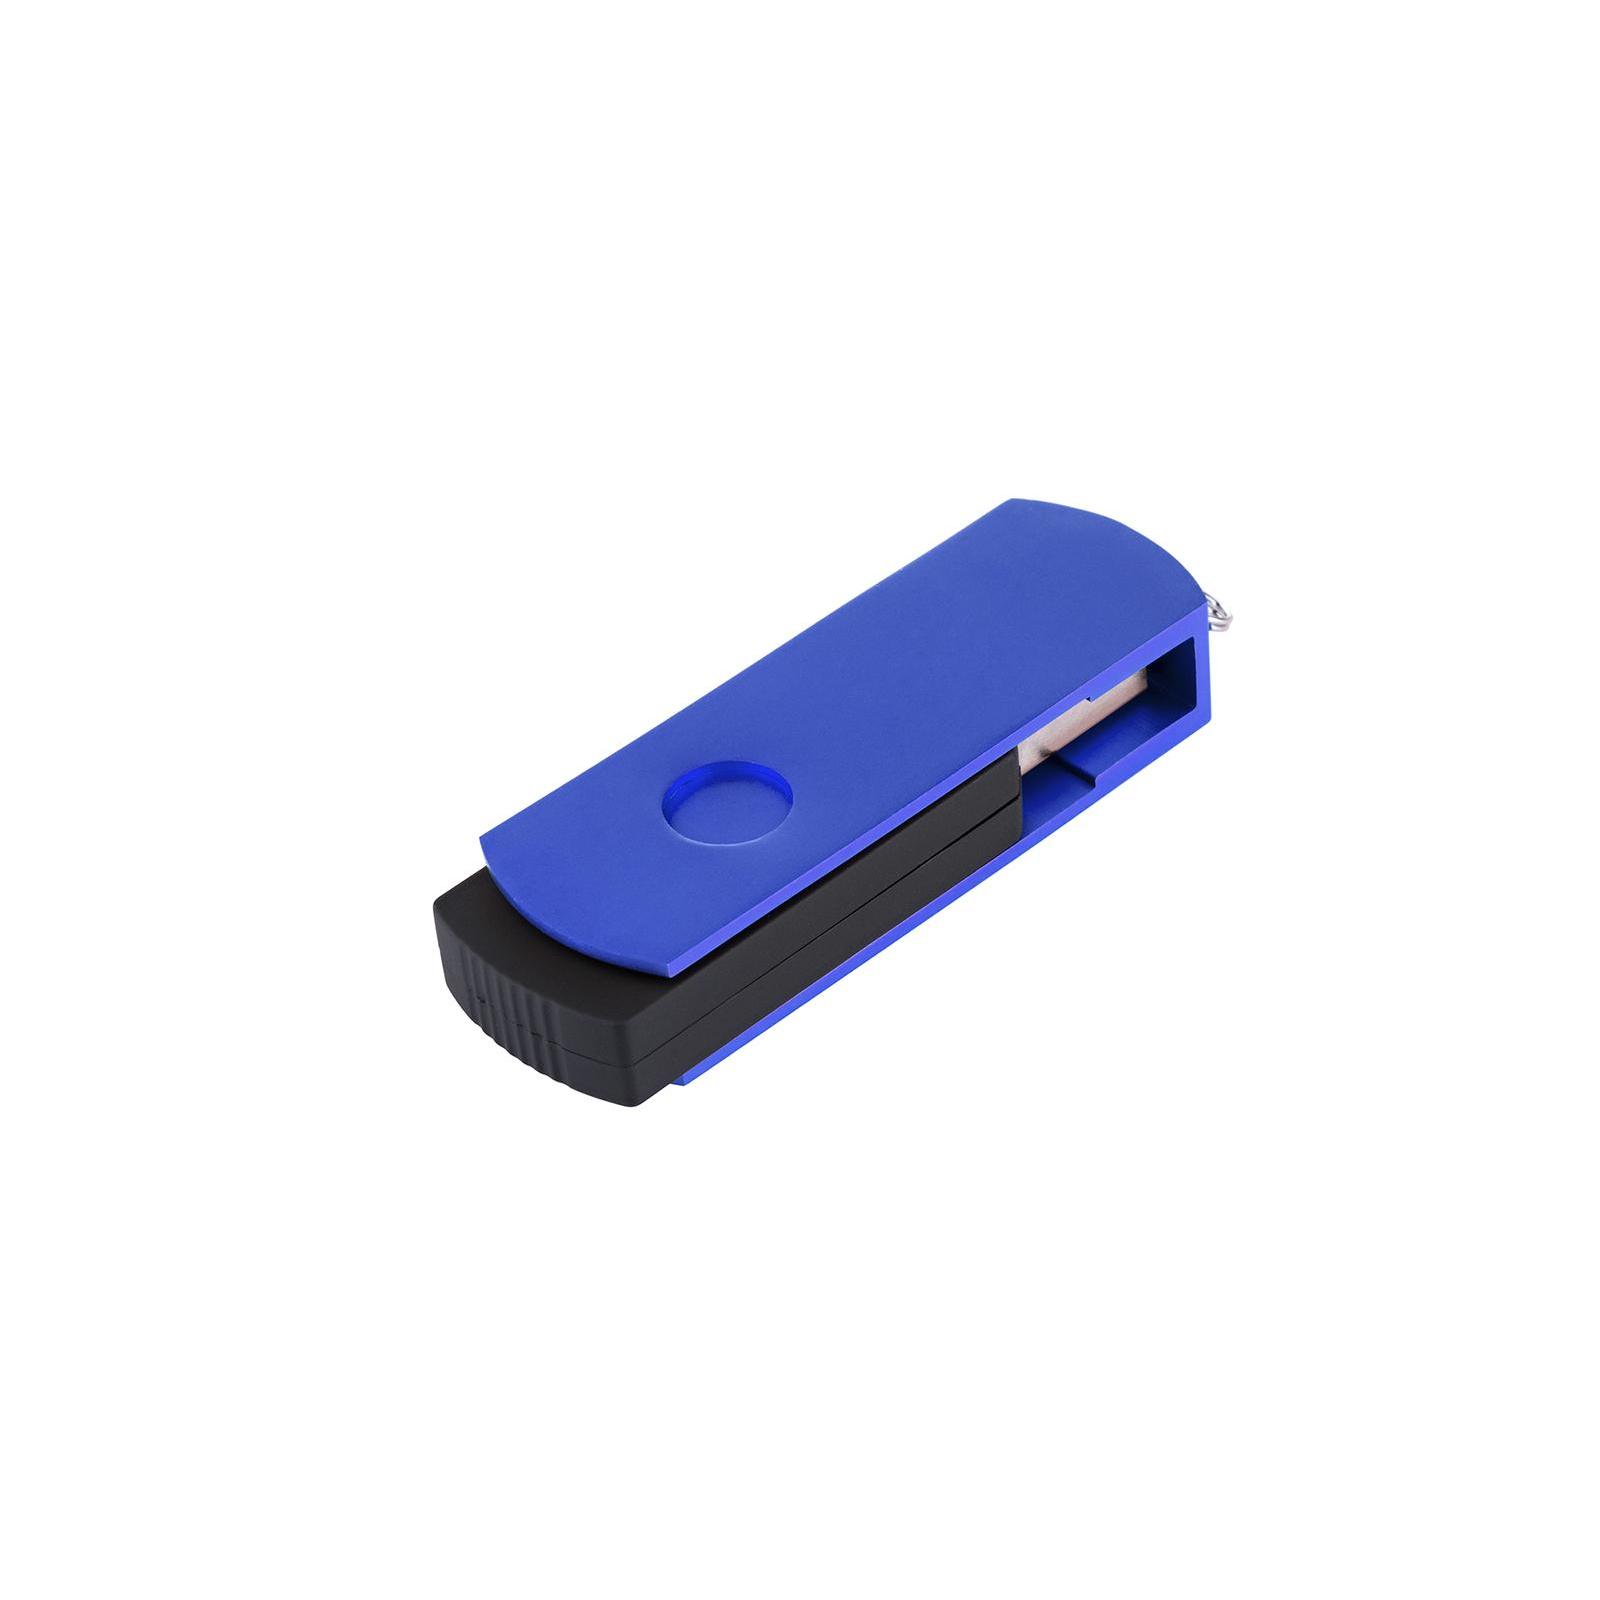 USB флеш накопитель eXceleram 128GB P2 Series Red/Black USB 3.1 Gen 1 (EXP2U3REB128) изображение 6